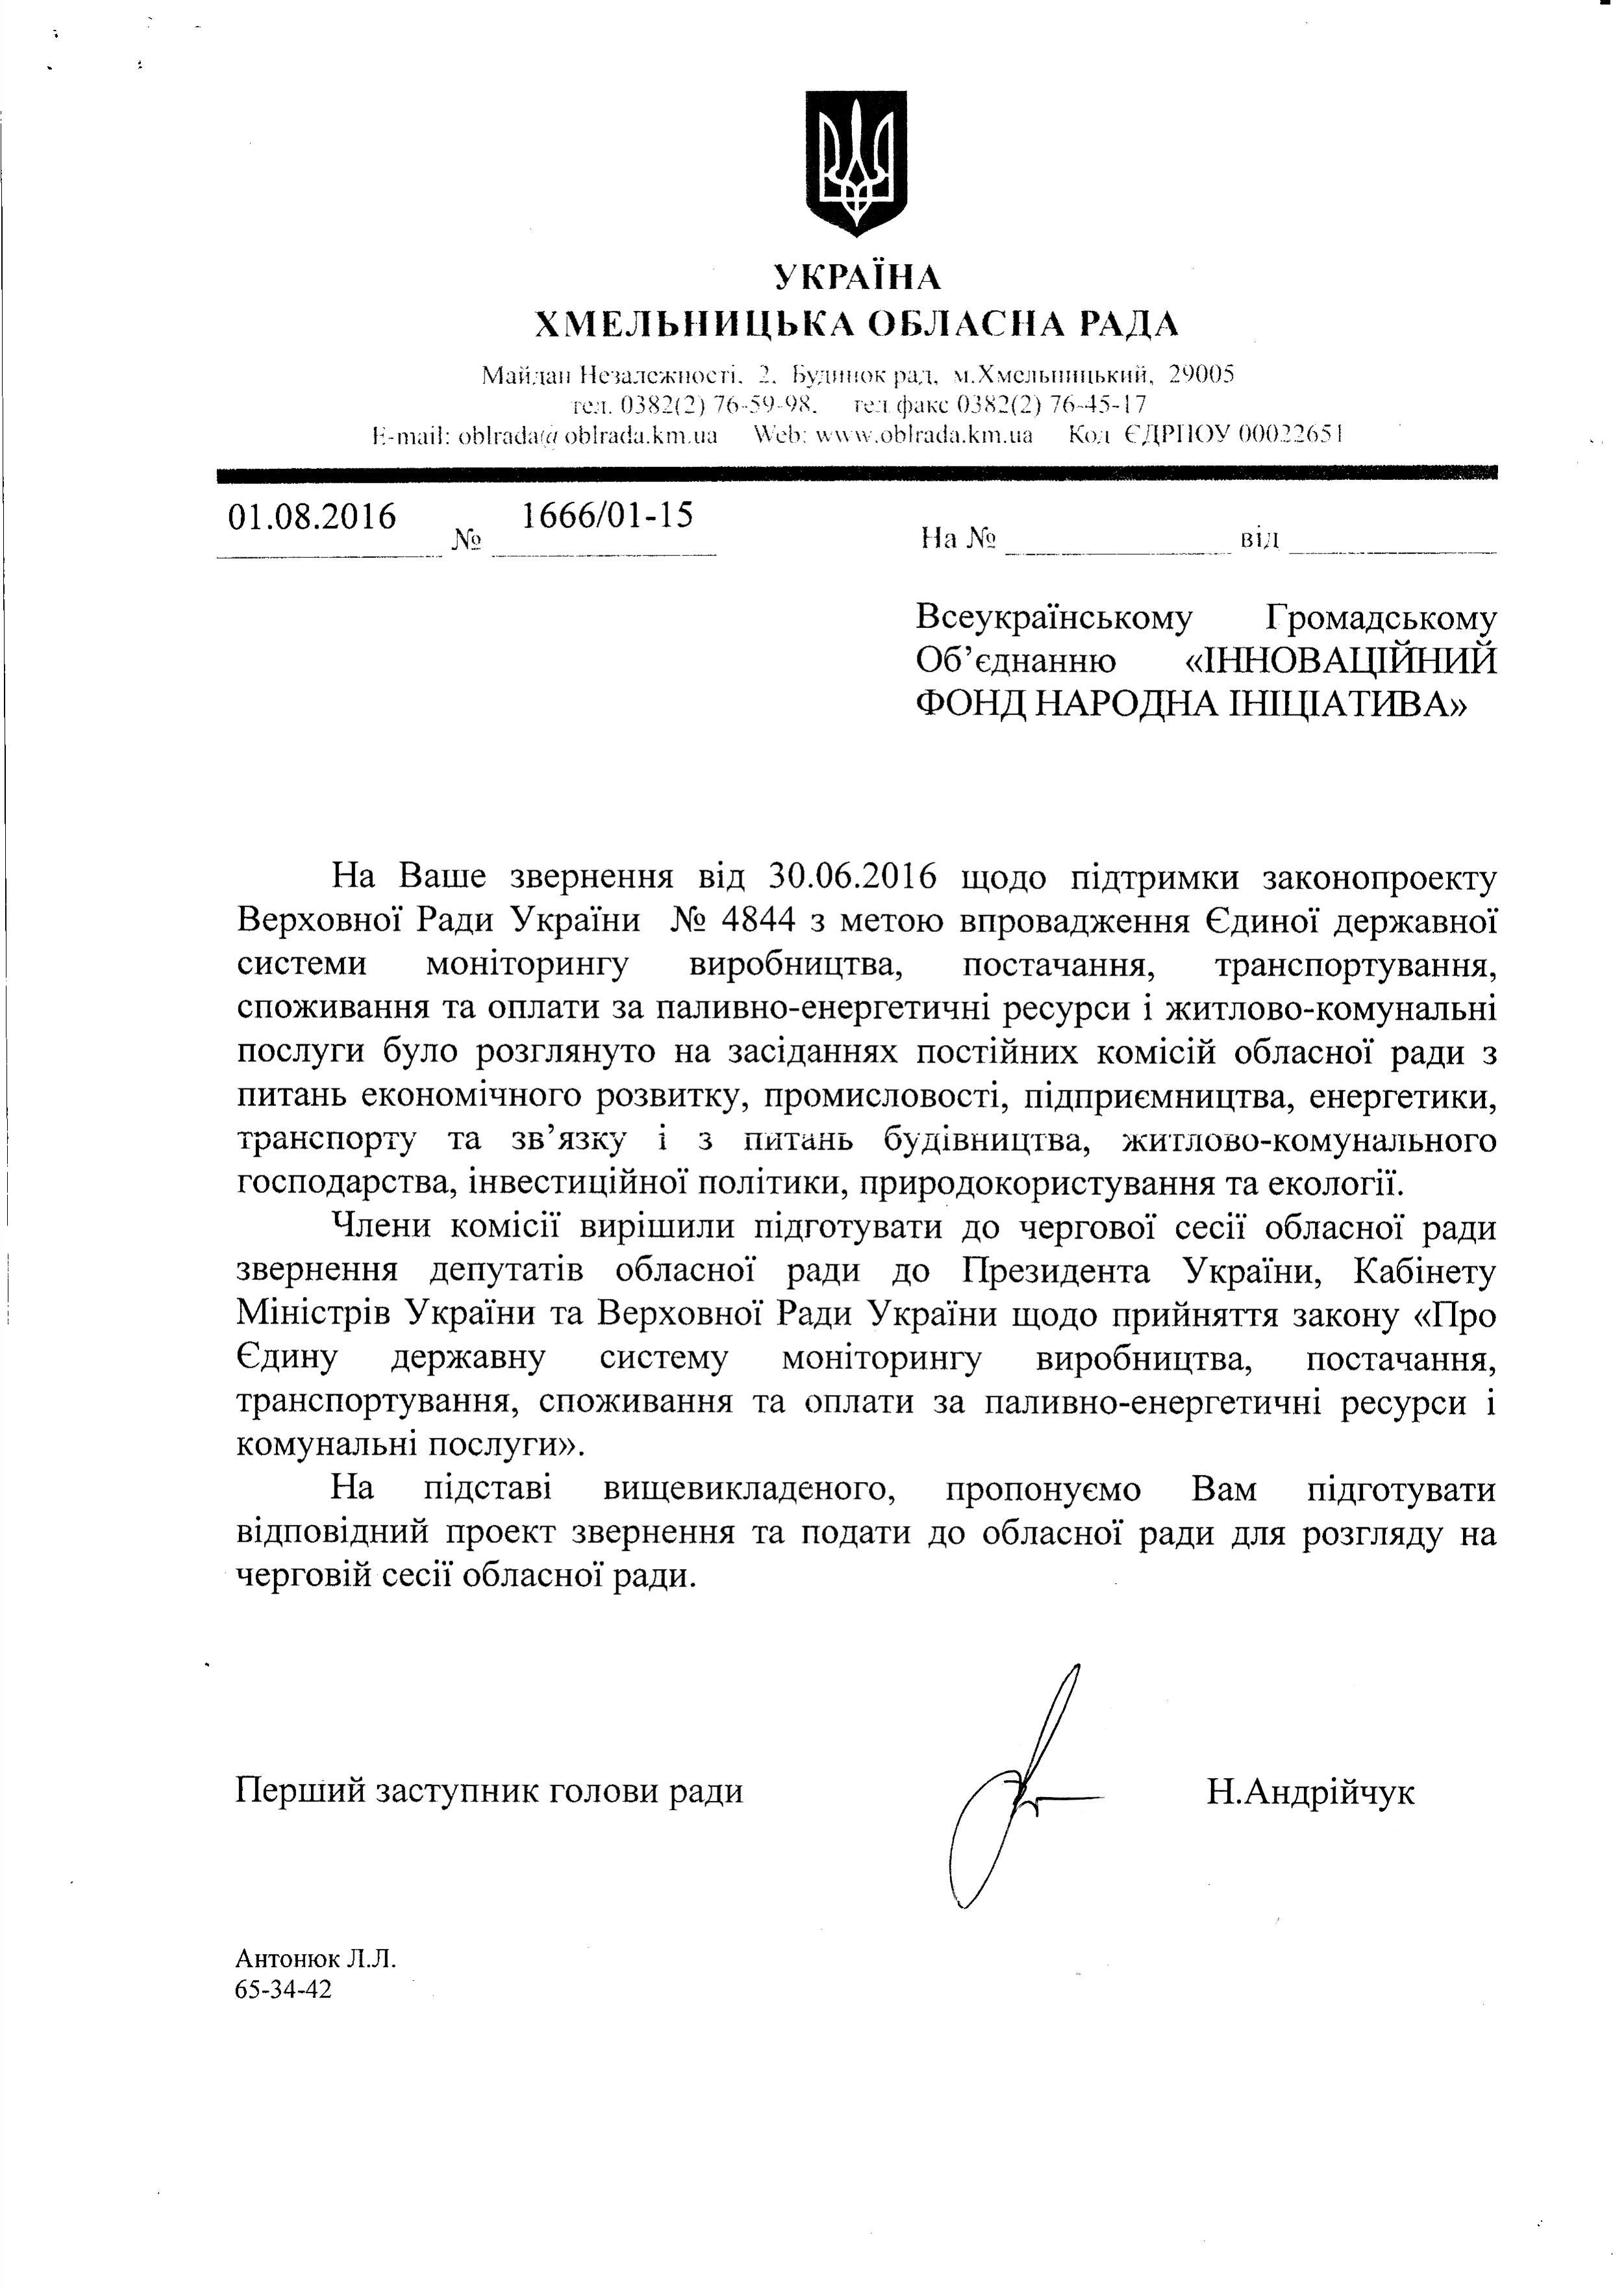 Хмельницька обл рада_01